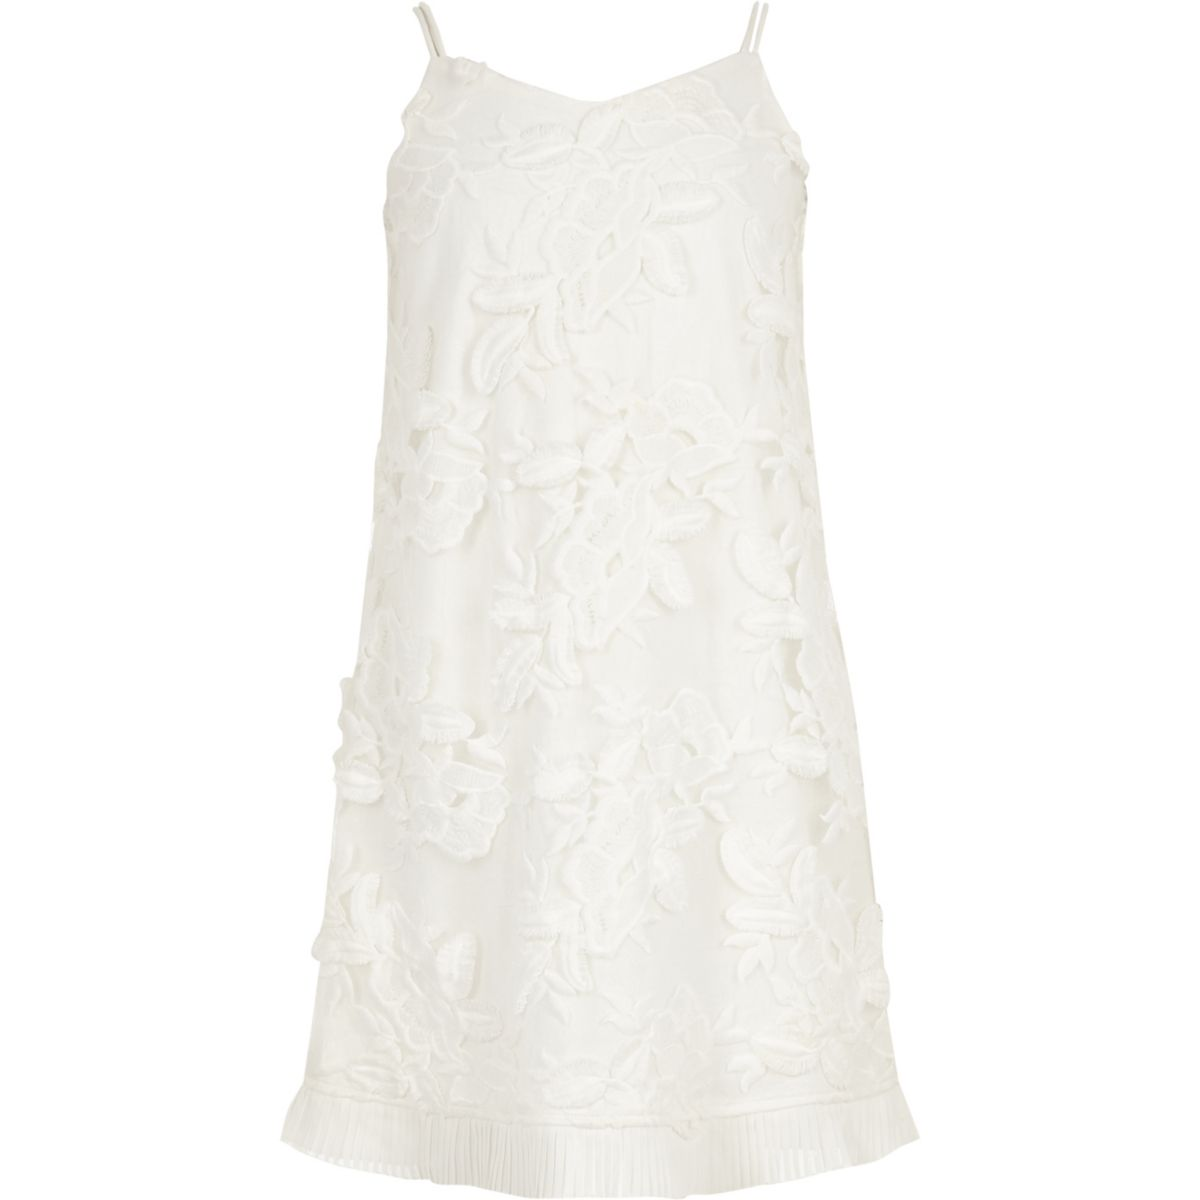 Robe trapèze en dentelle fleurie blanche pour fille